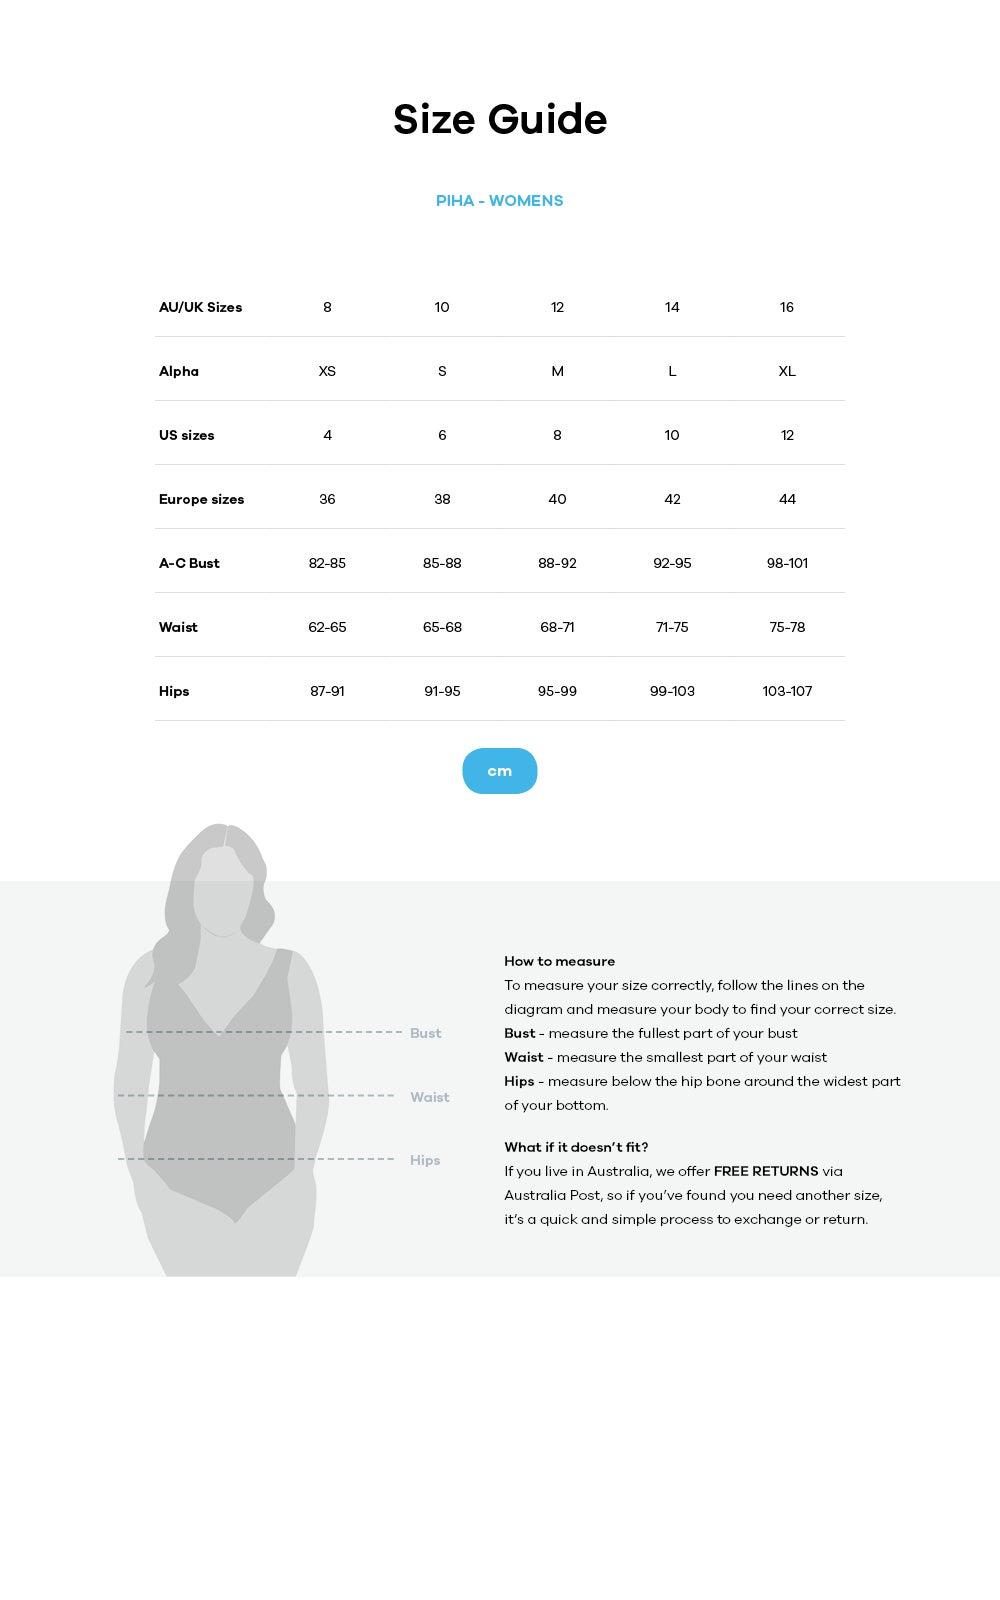 Piha size guide